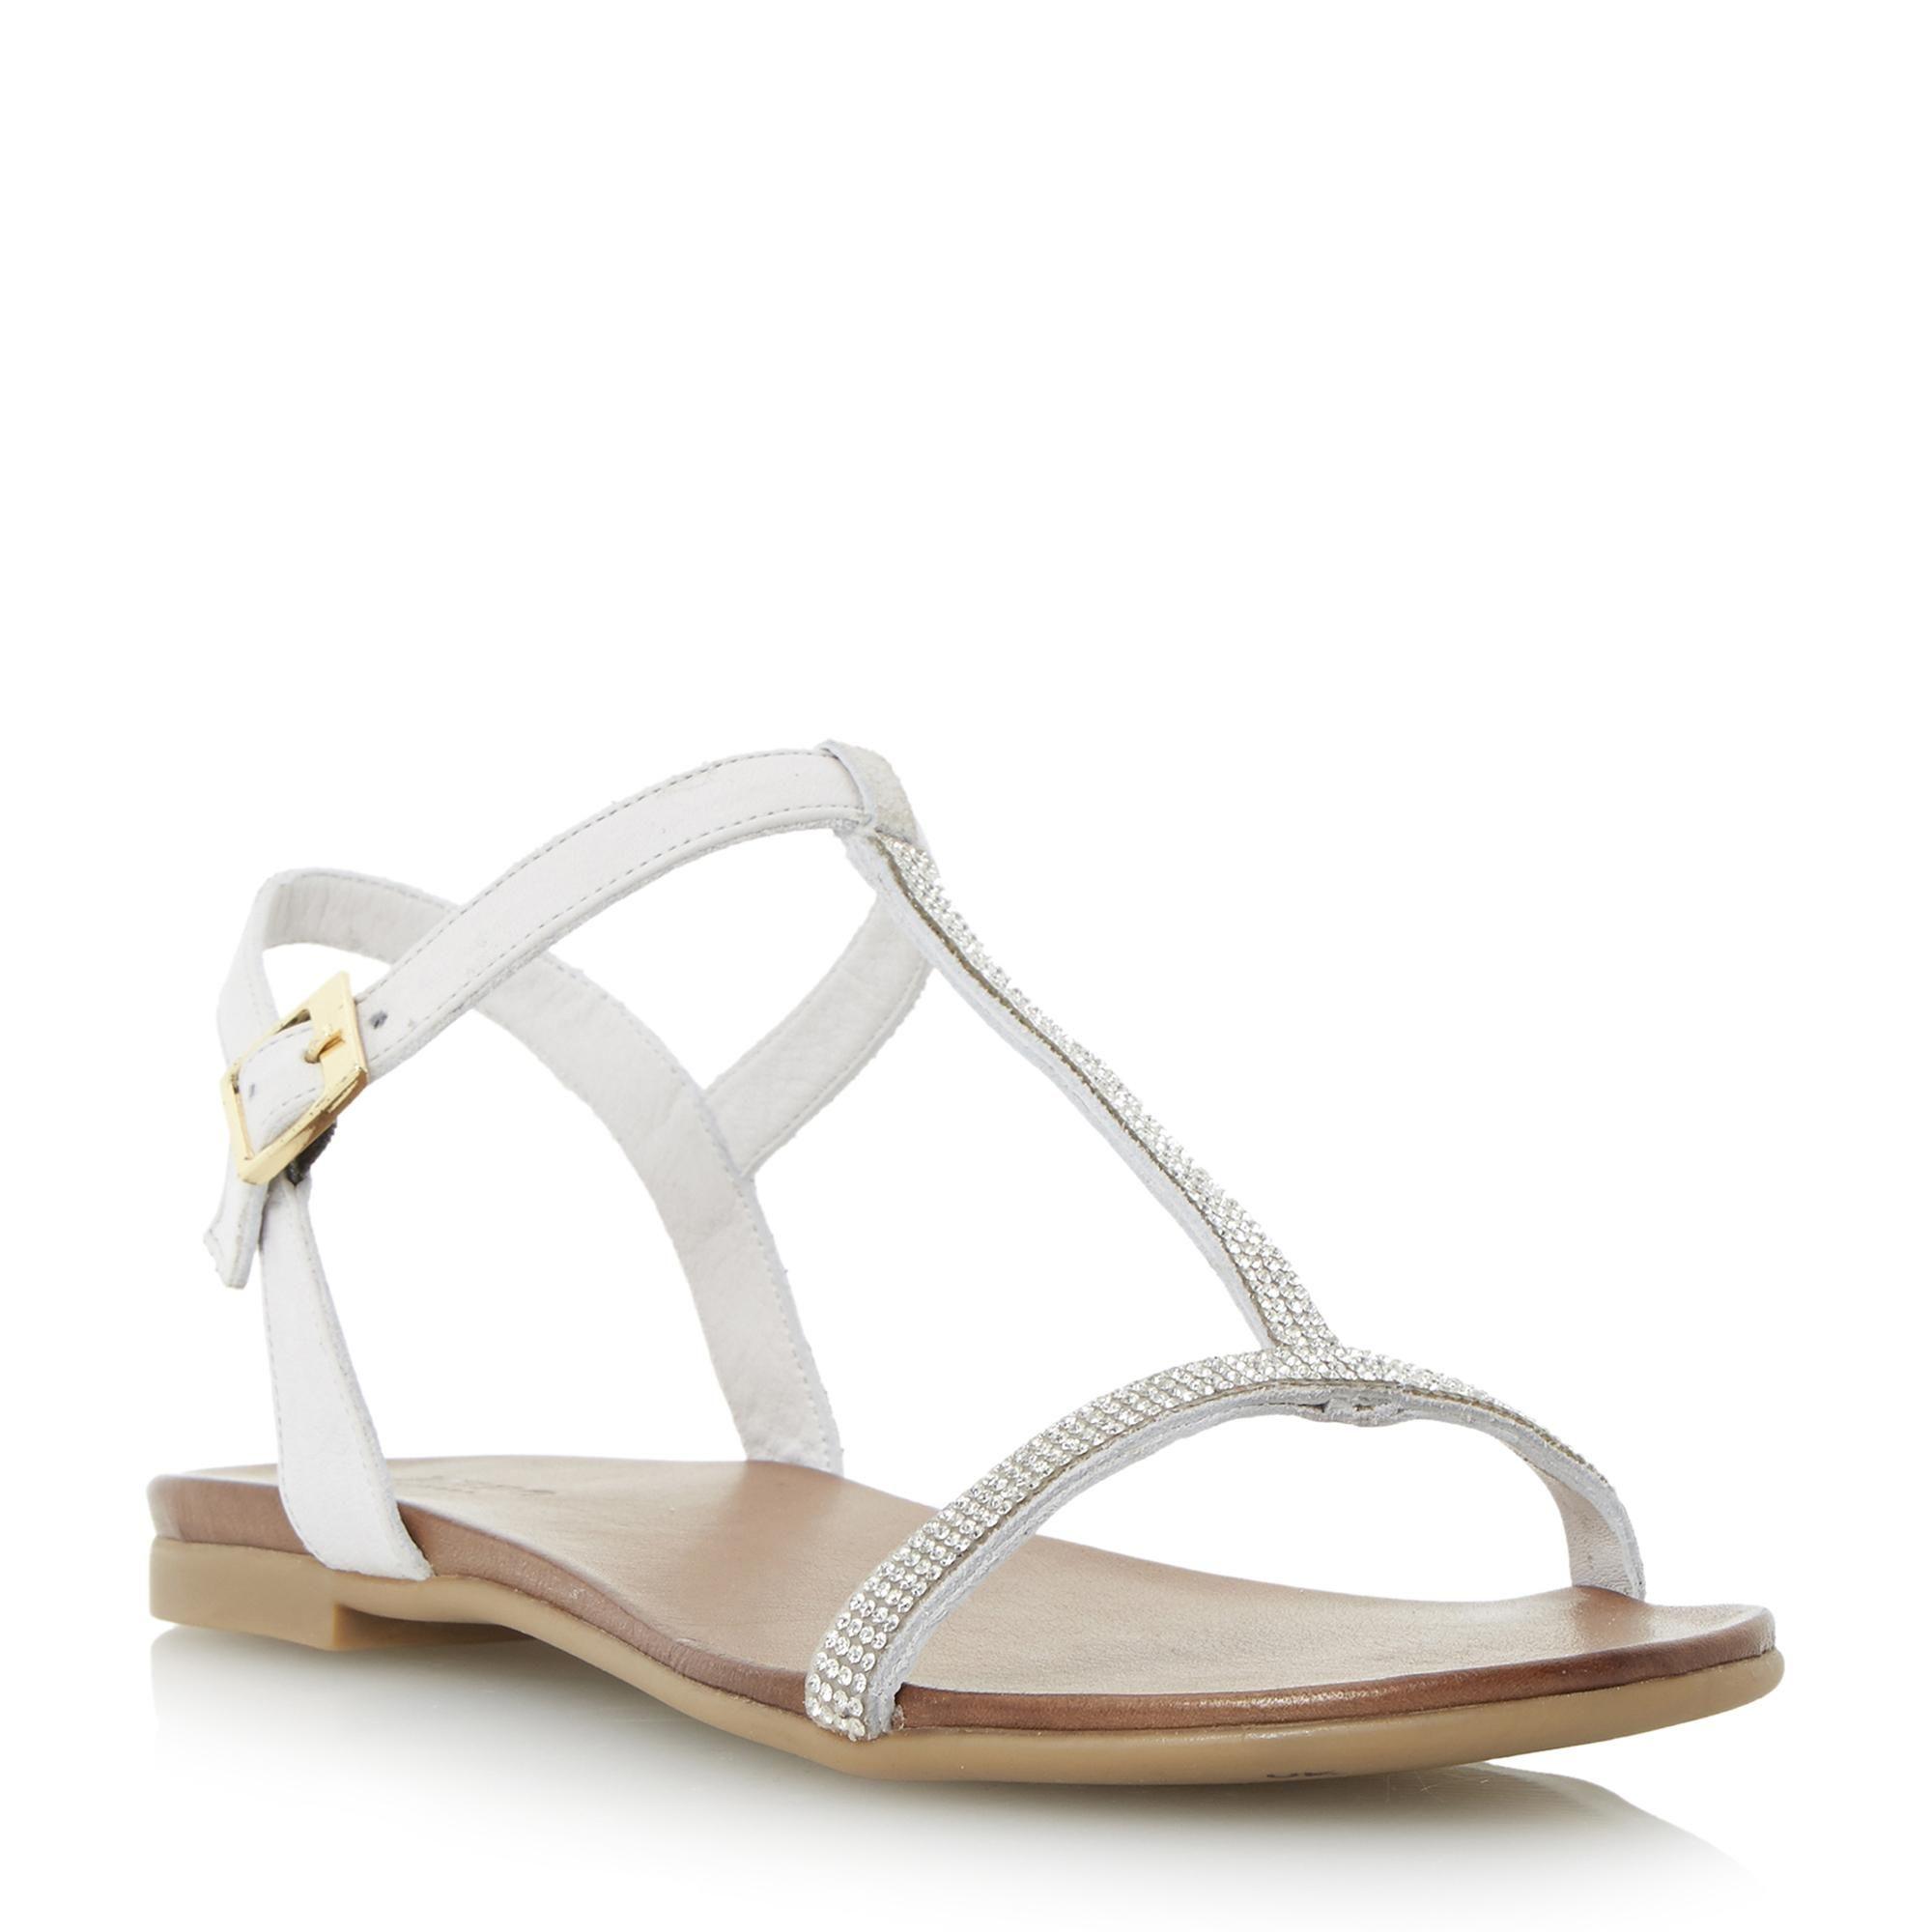 ee44611bafa DUNE LADIES LIFESTORY - Diamante T-bar Sandal - white